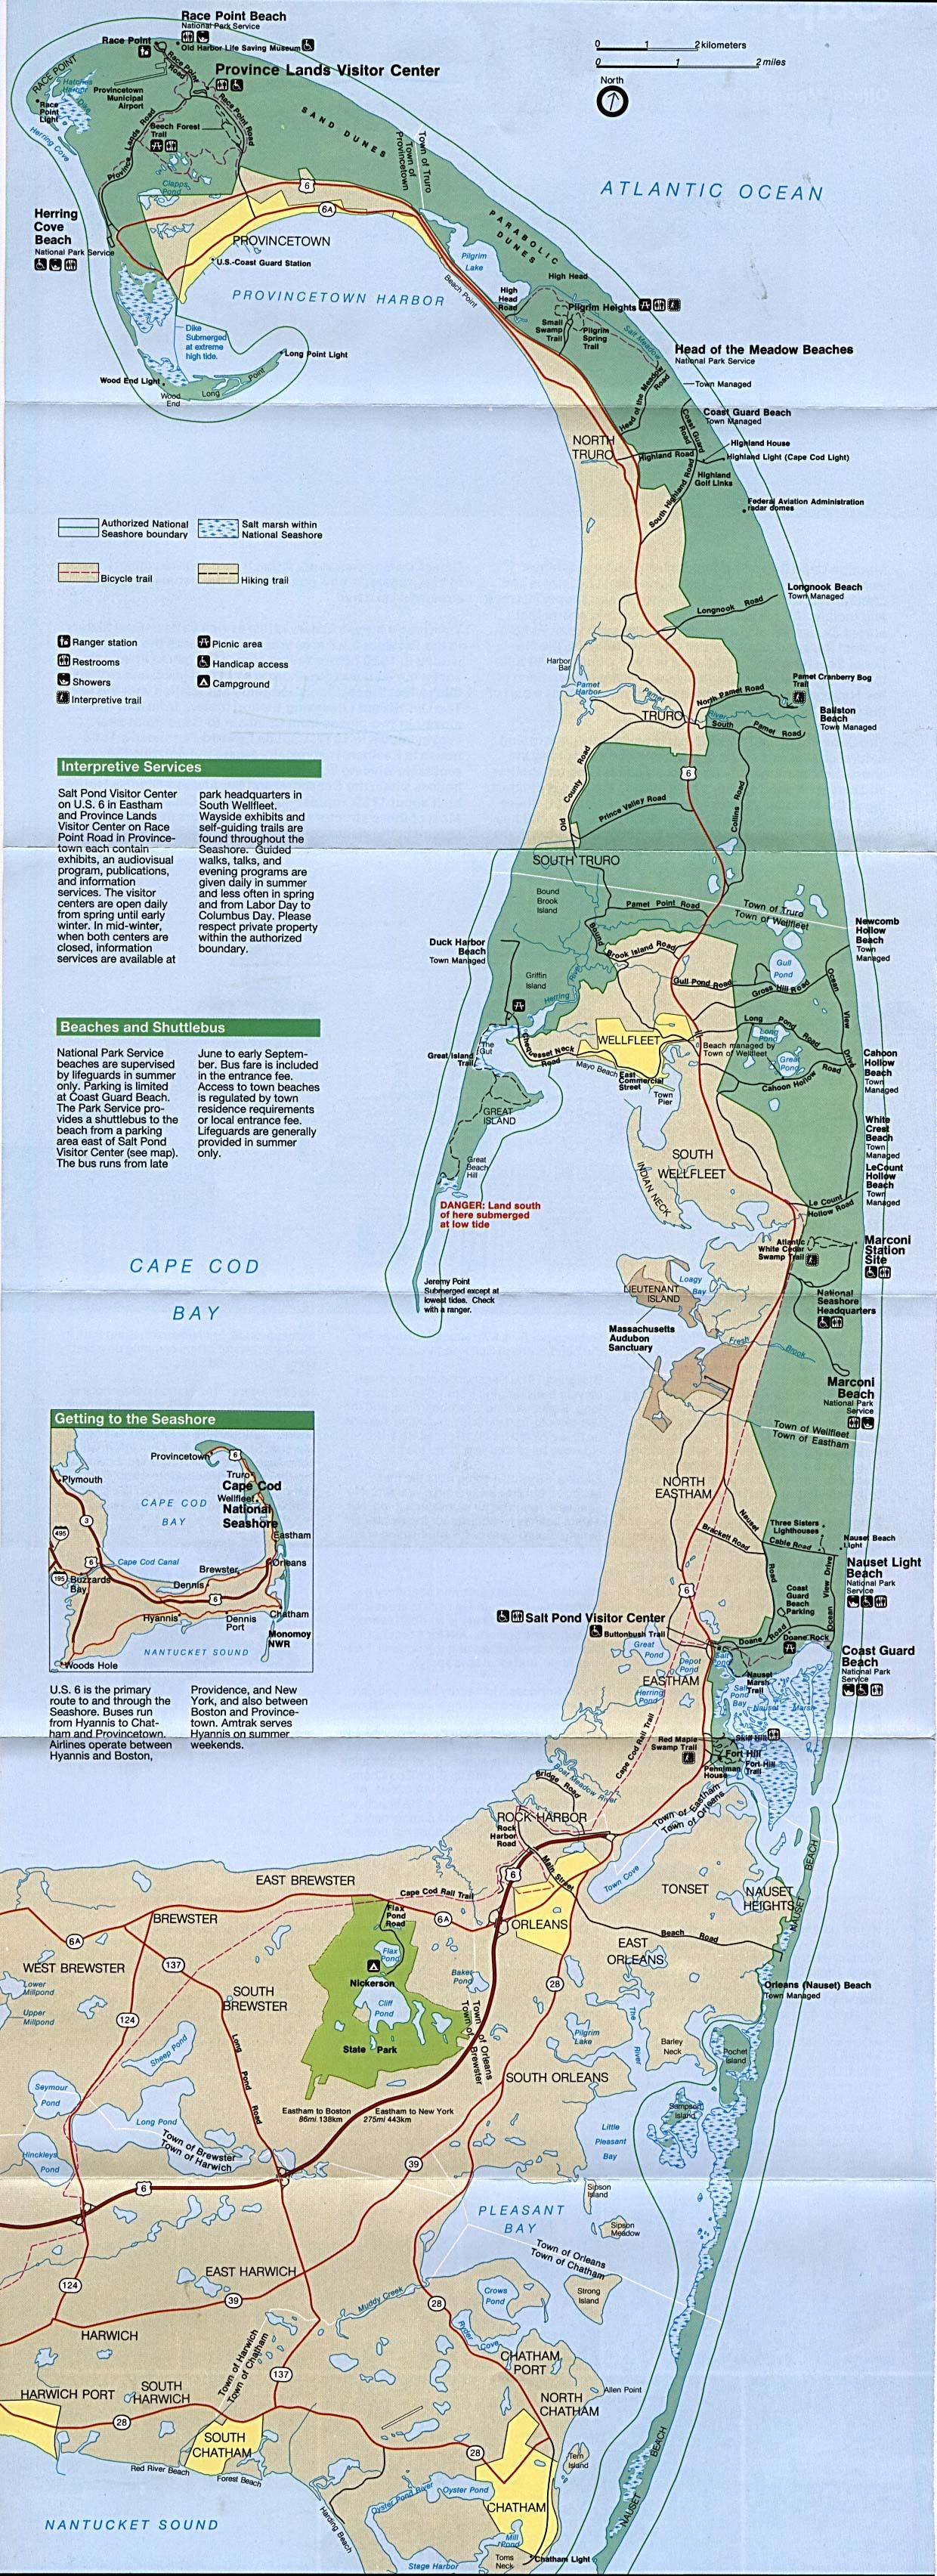 Cape Cod National Seashore Park Map Massachusetts United States